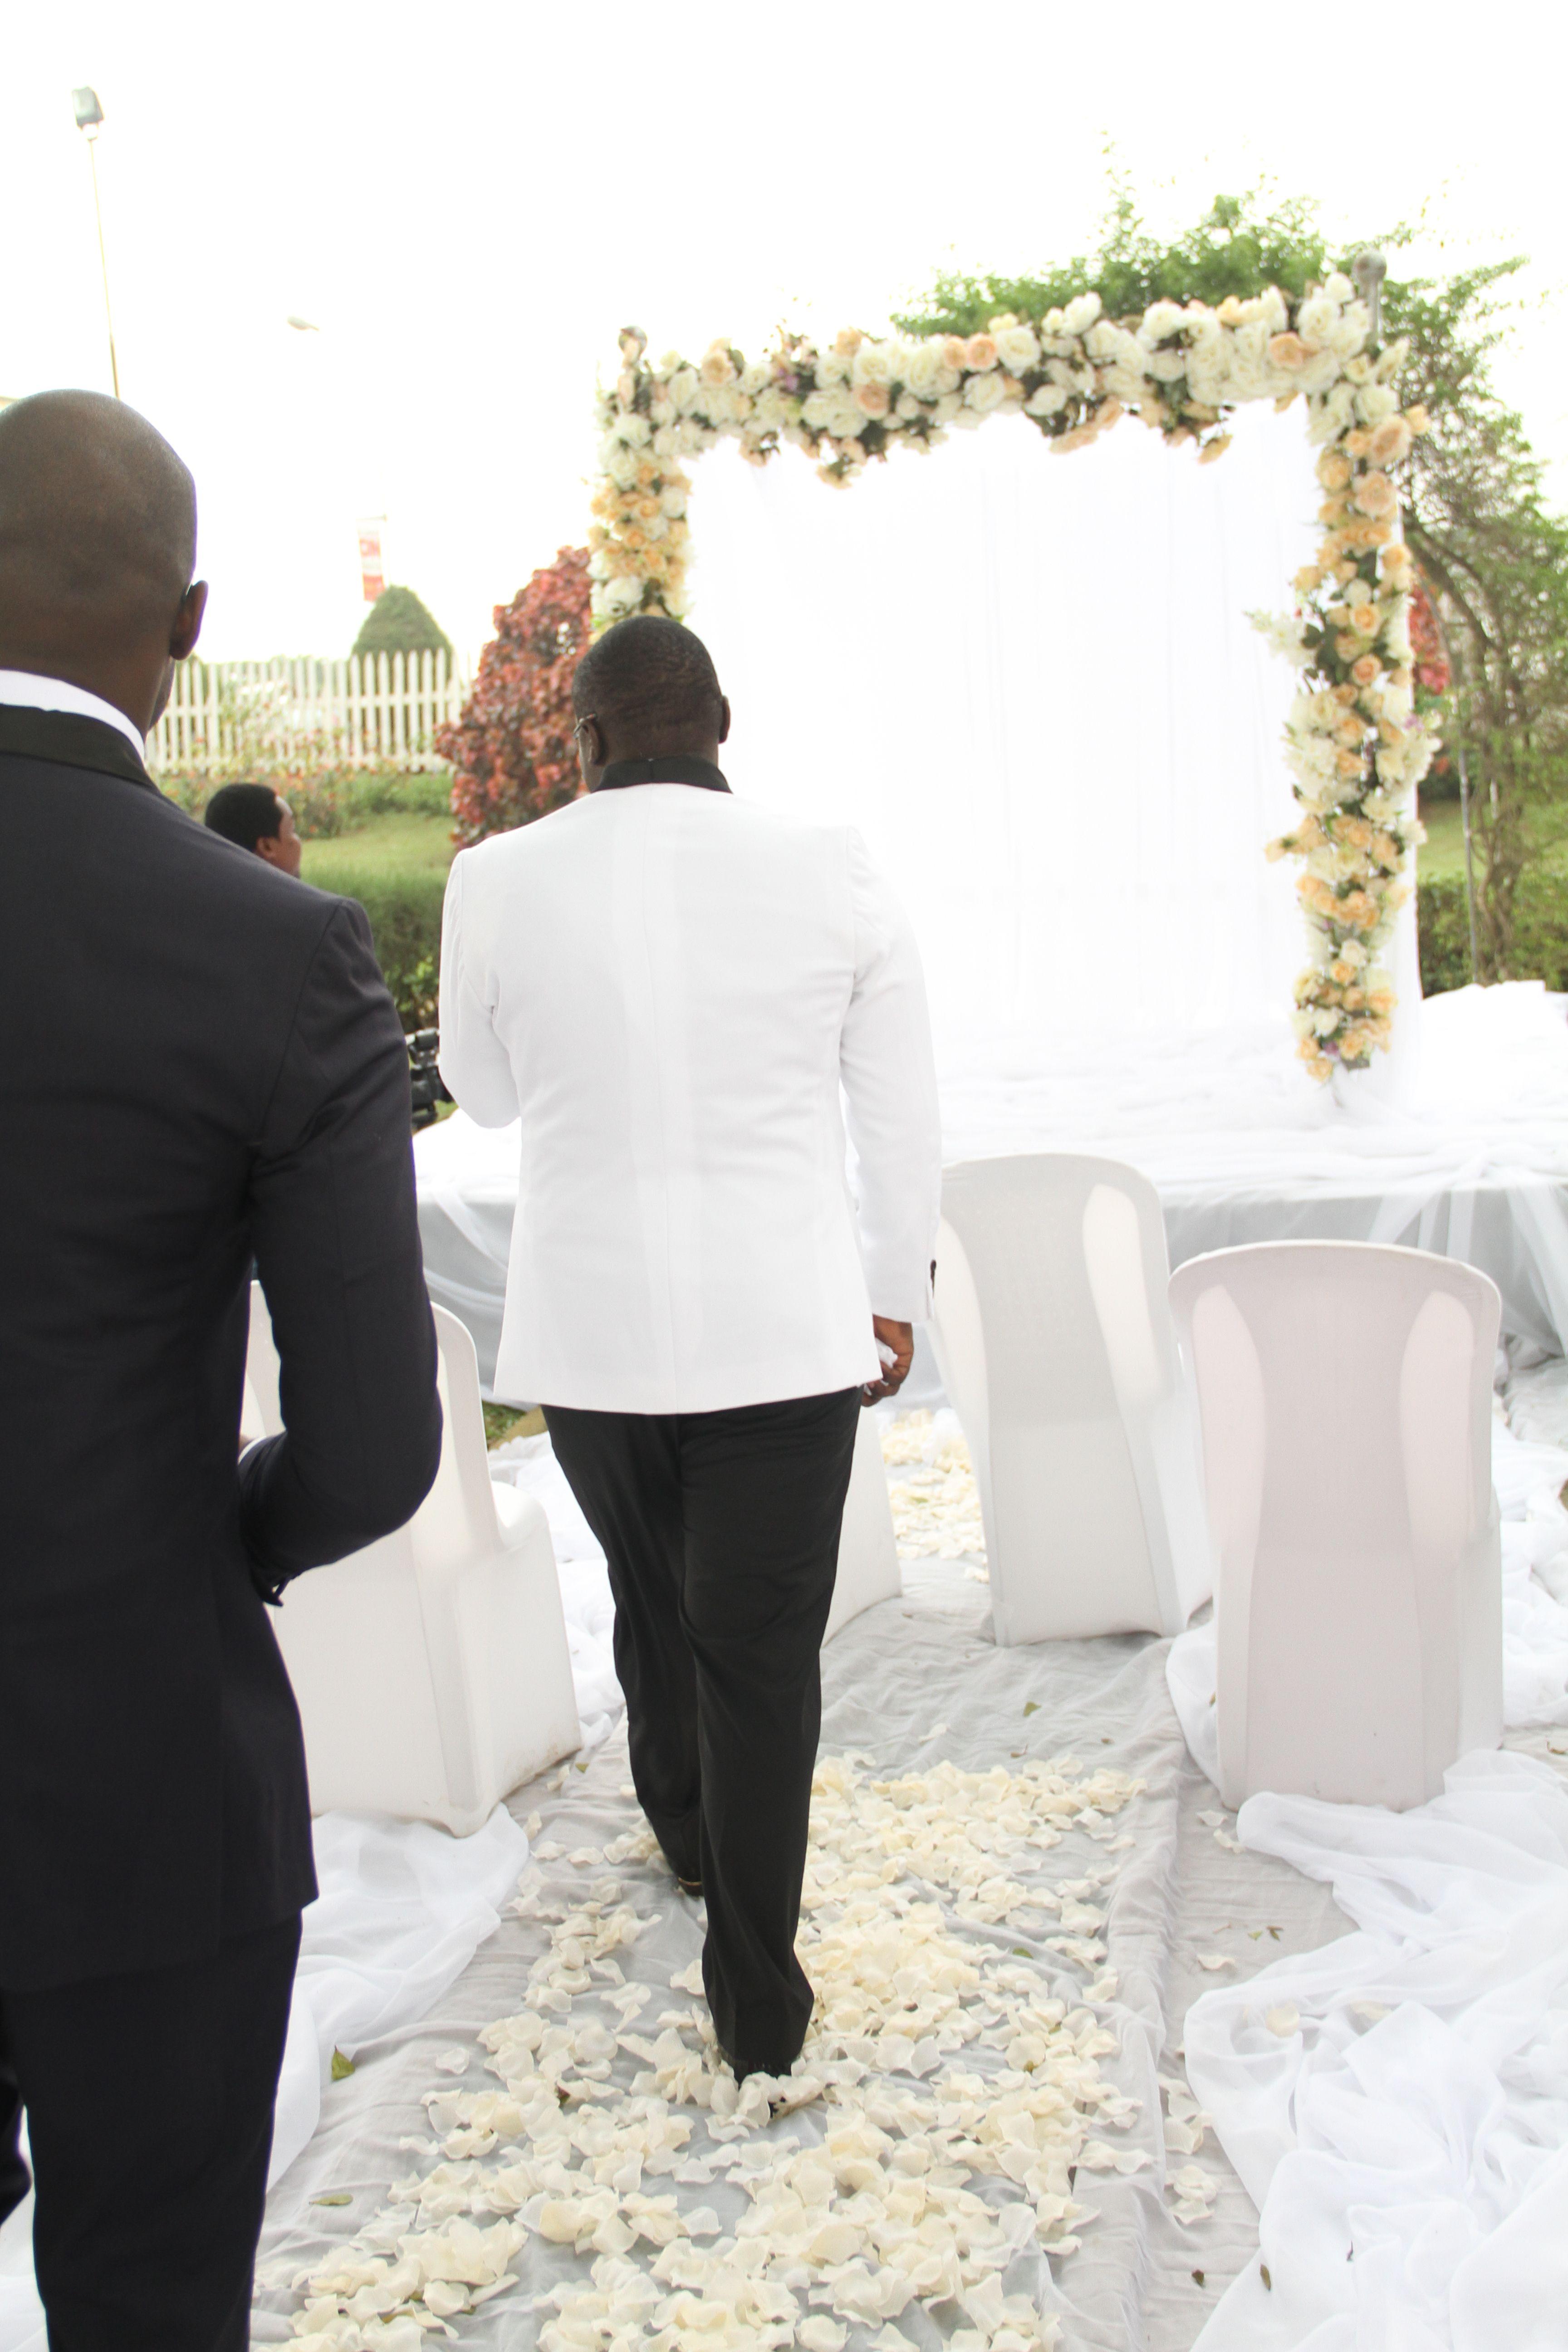 JHALOBIA GARDEN WEDDING VENUE IN LAGOS NIGERIA : FLOWER ARCH FOR EXCHANGE OF VOWS